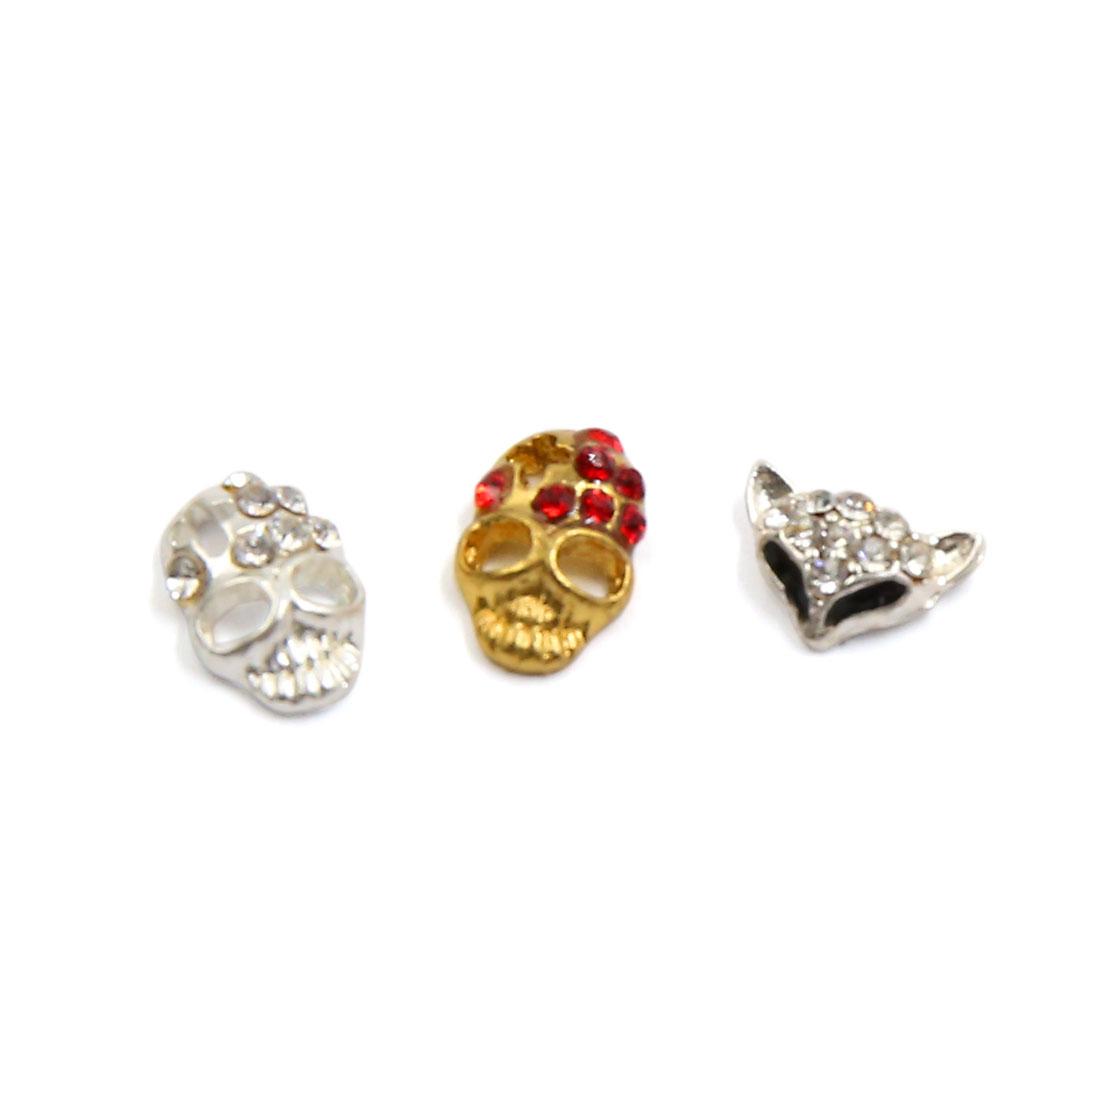 3pcs Skeleton Head Shape Glitter Nail Art Salon Charm Decoration Tip Jewelry